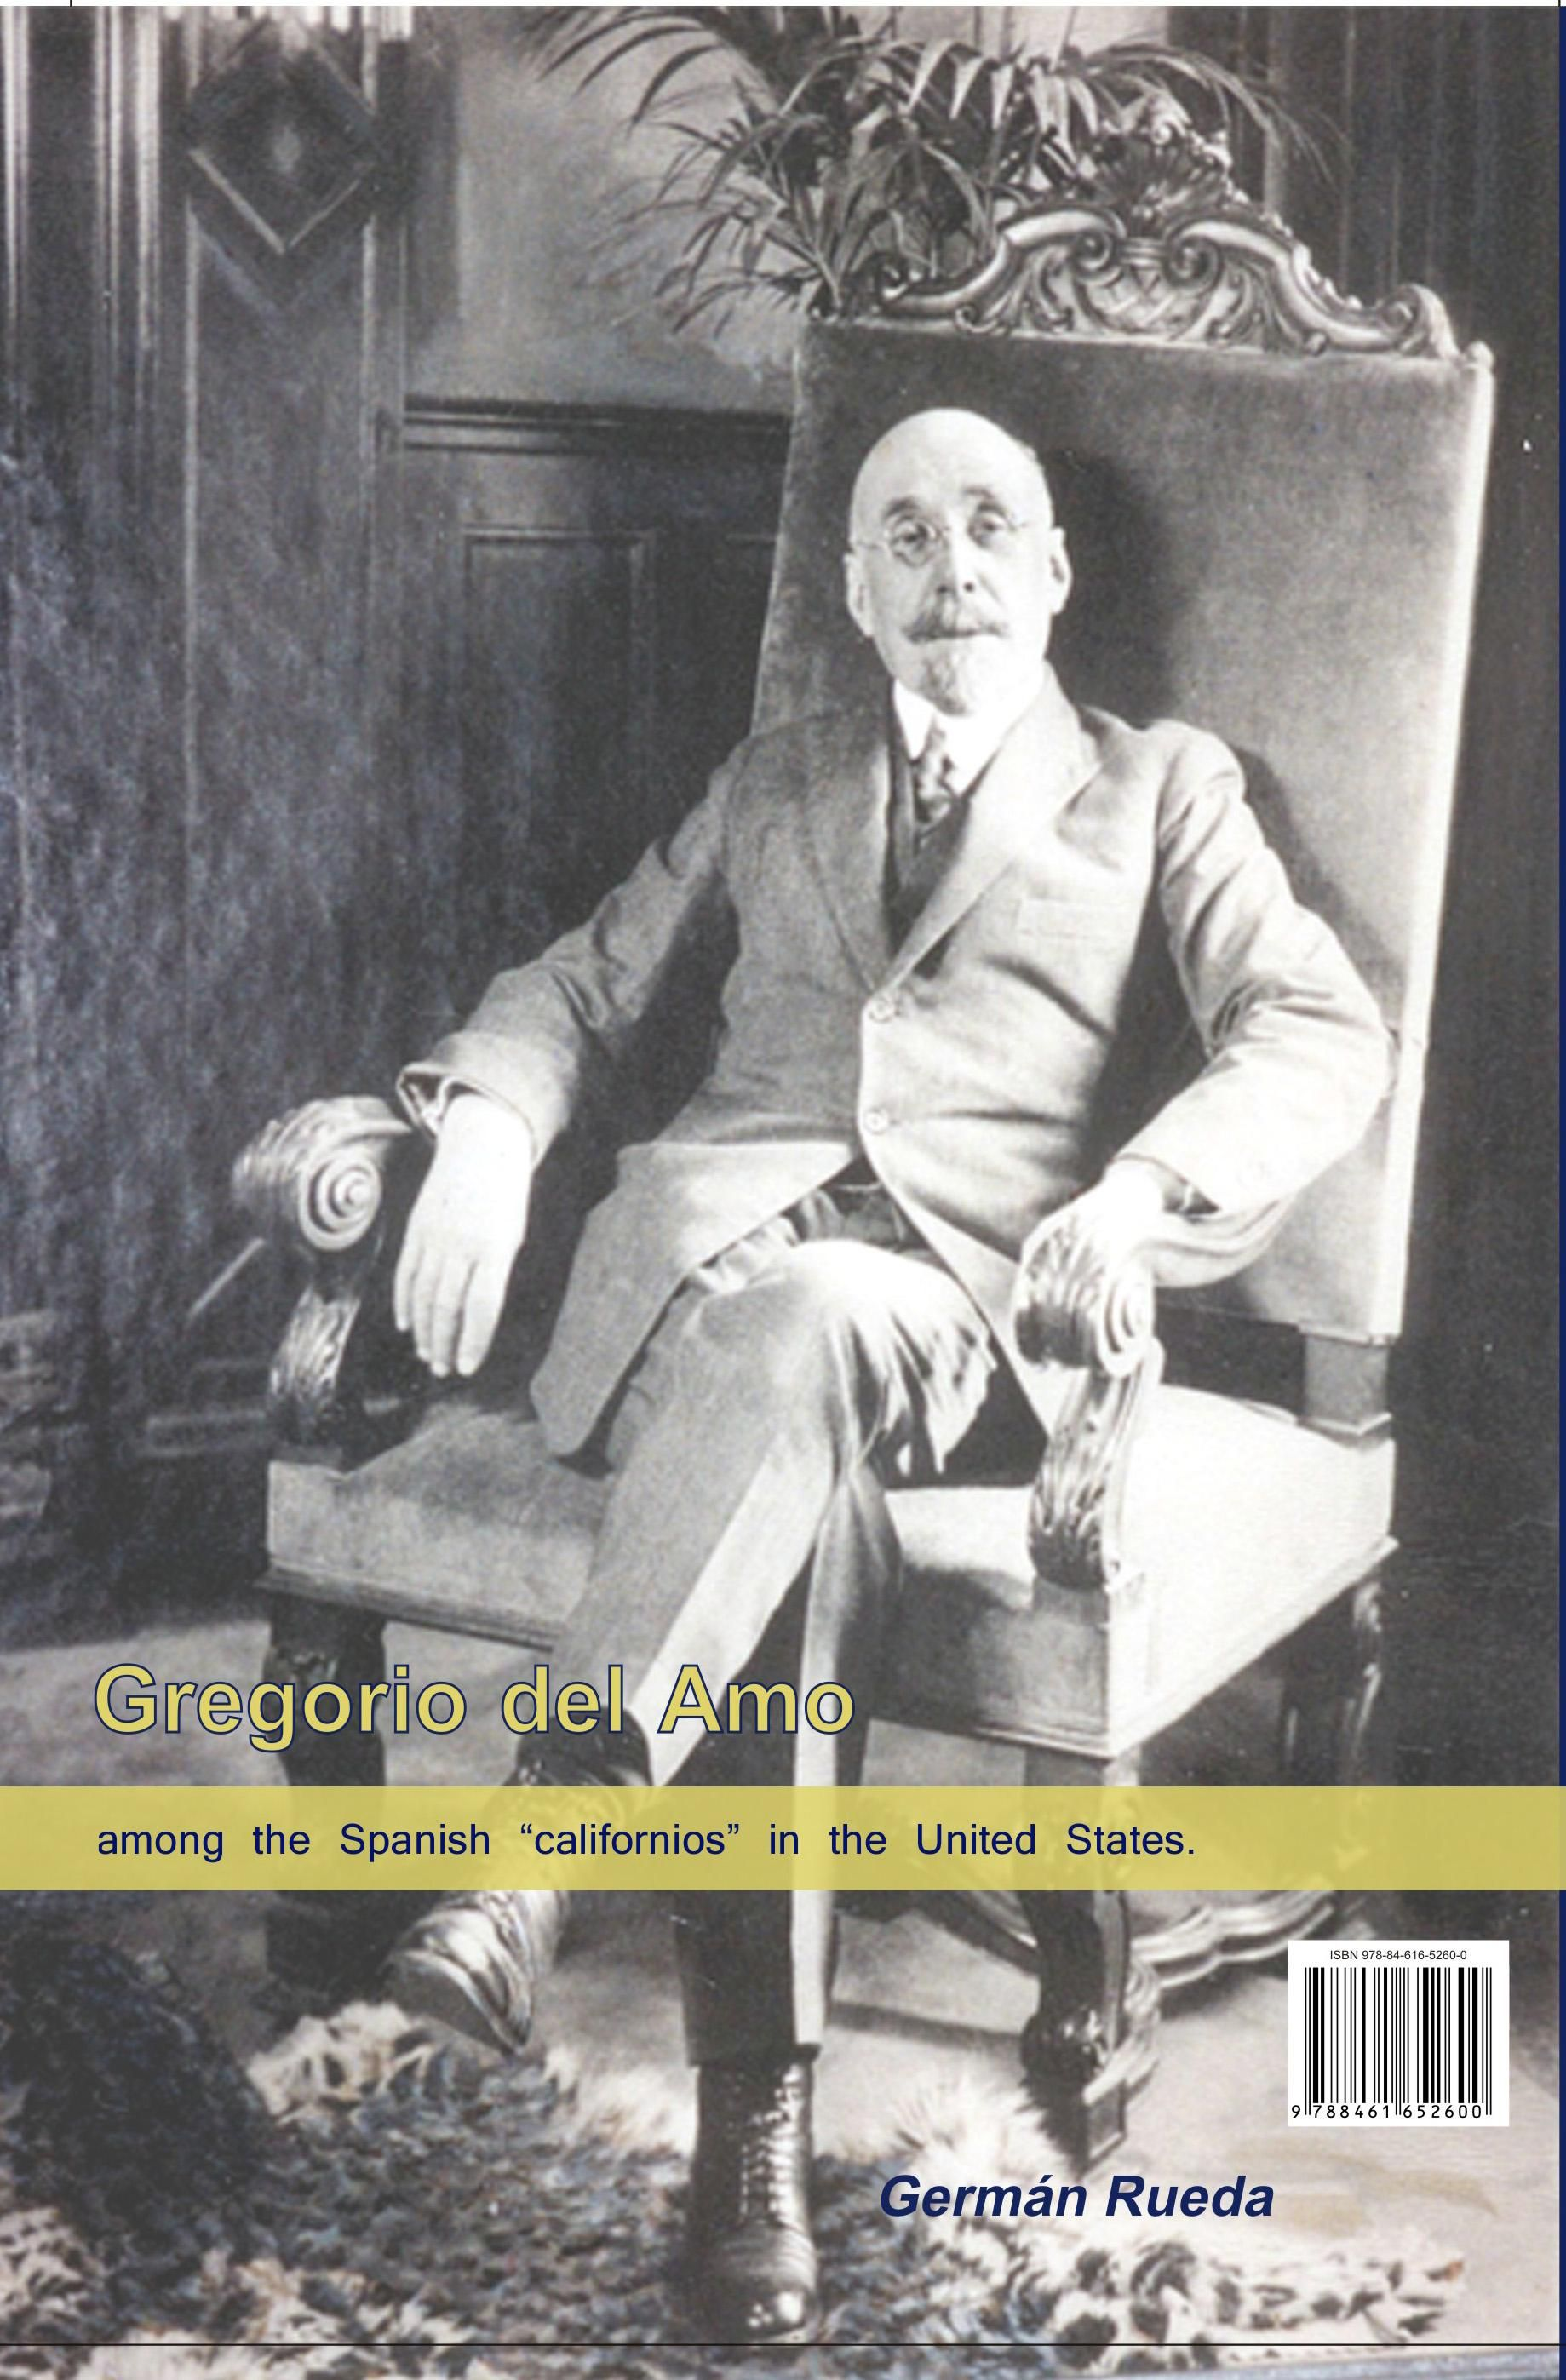 GREGORIO DEL AMO AMONG THE SPANISH CALIFORNIOS IN THE UNITED STATES